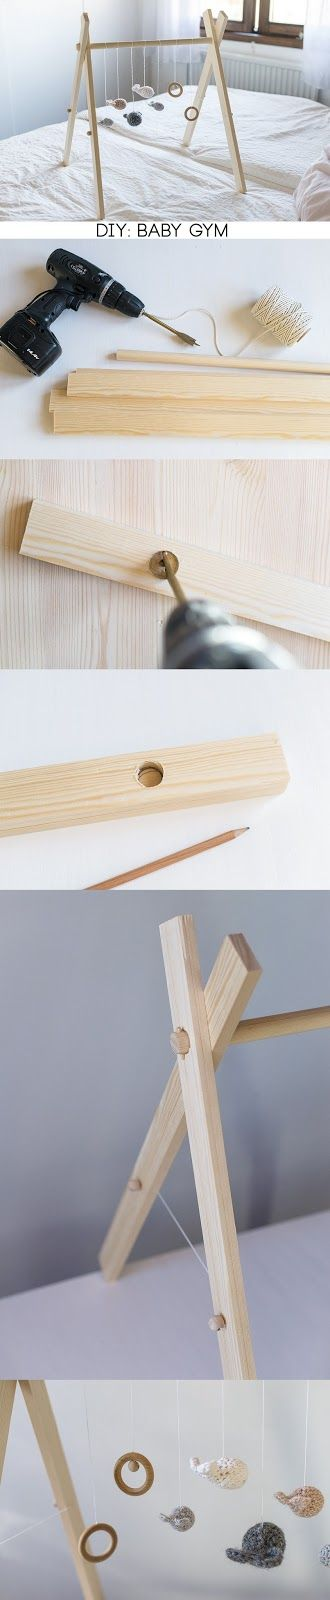 Woodworking: Making DIY Baby GYM